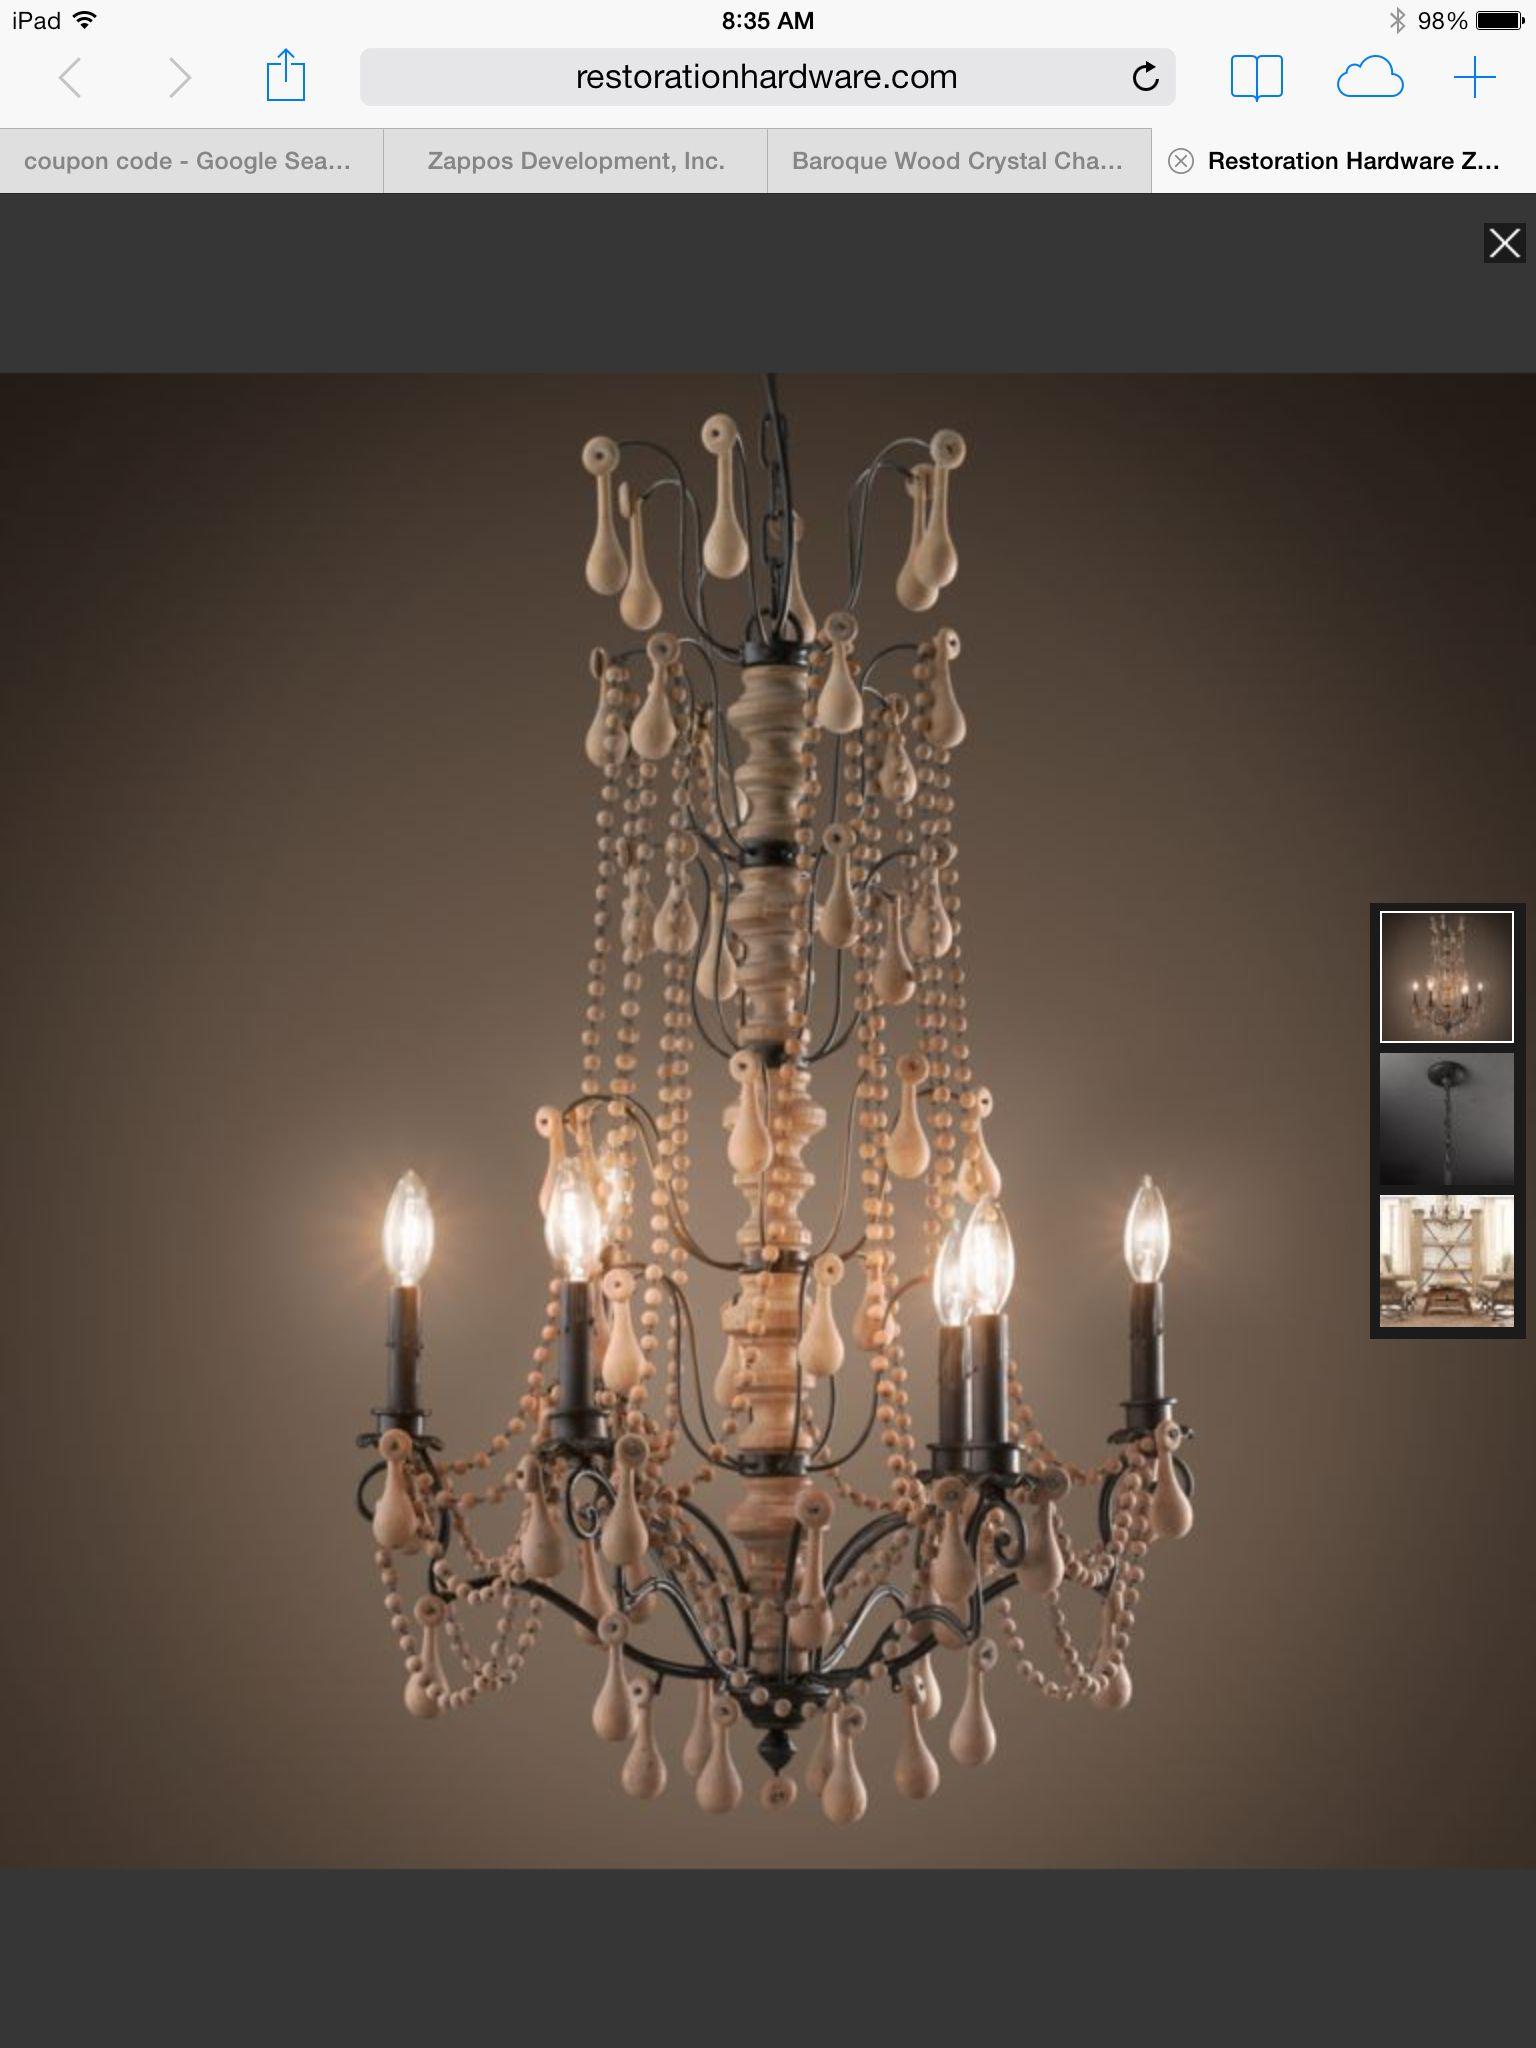 Pretty Chandelier, Ceiling restoration, Wood chandelier